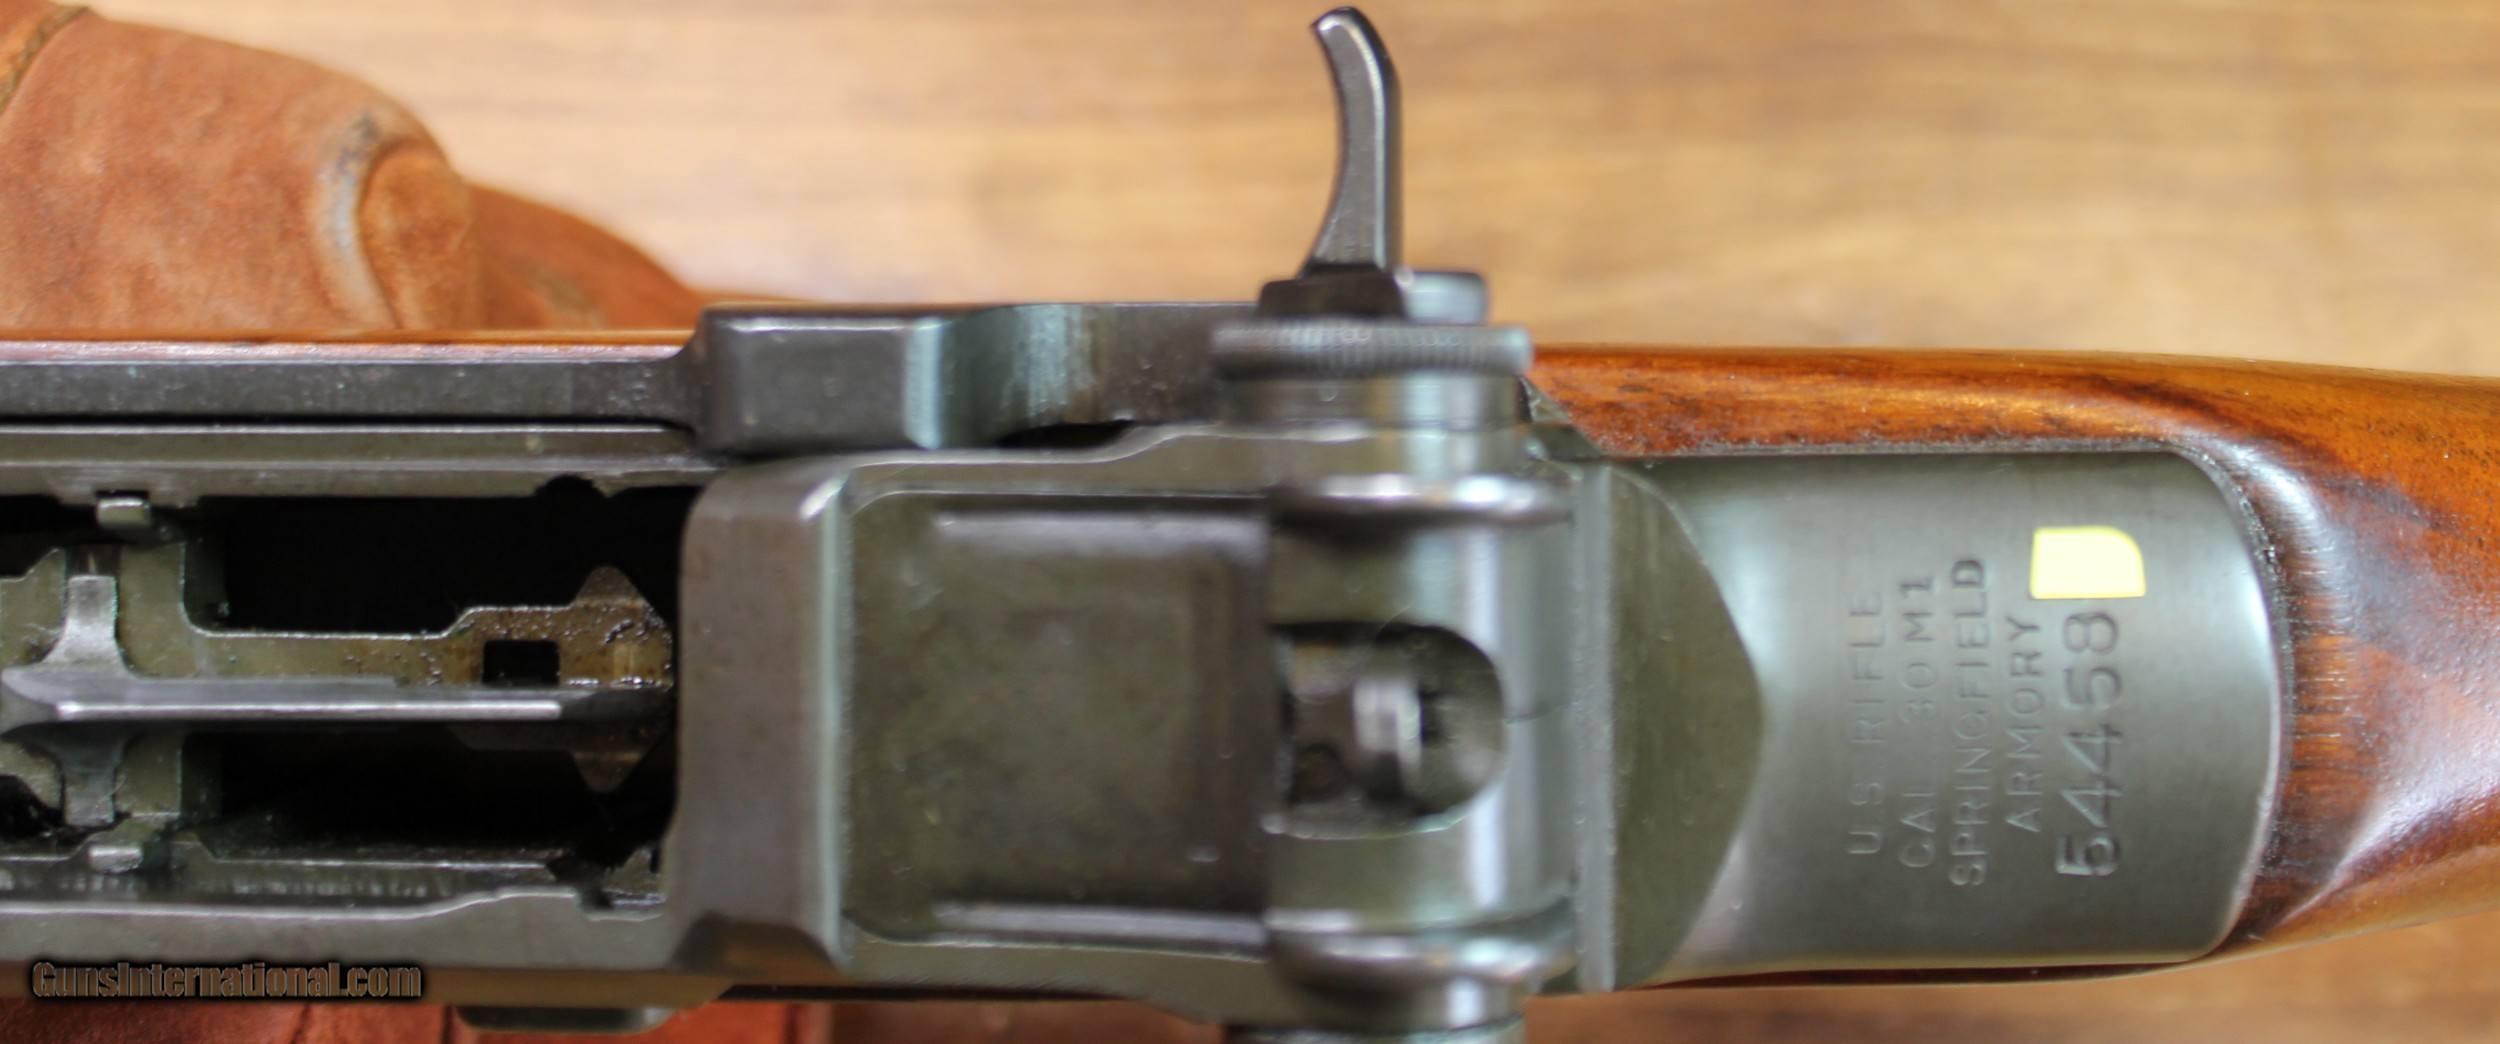 M1 Garand dating serienummers